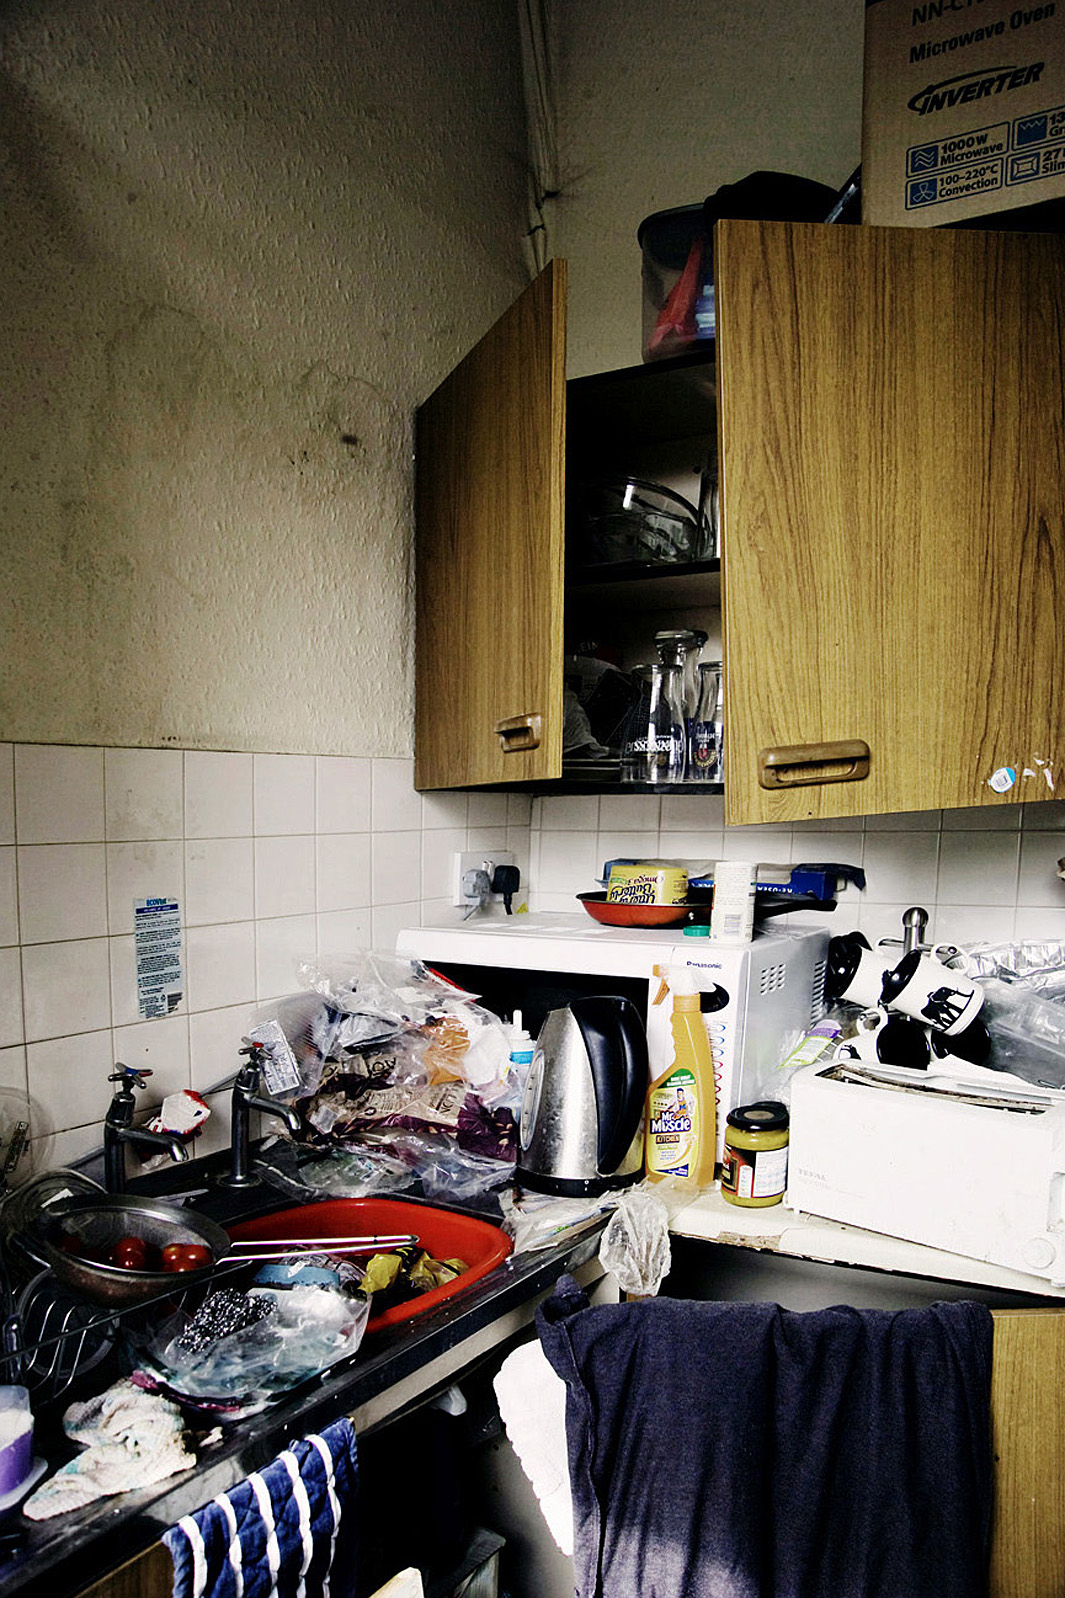 Kitchen, London.